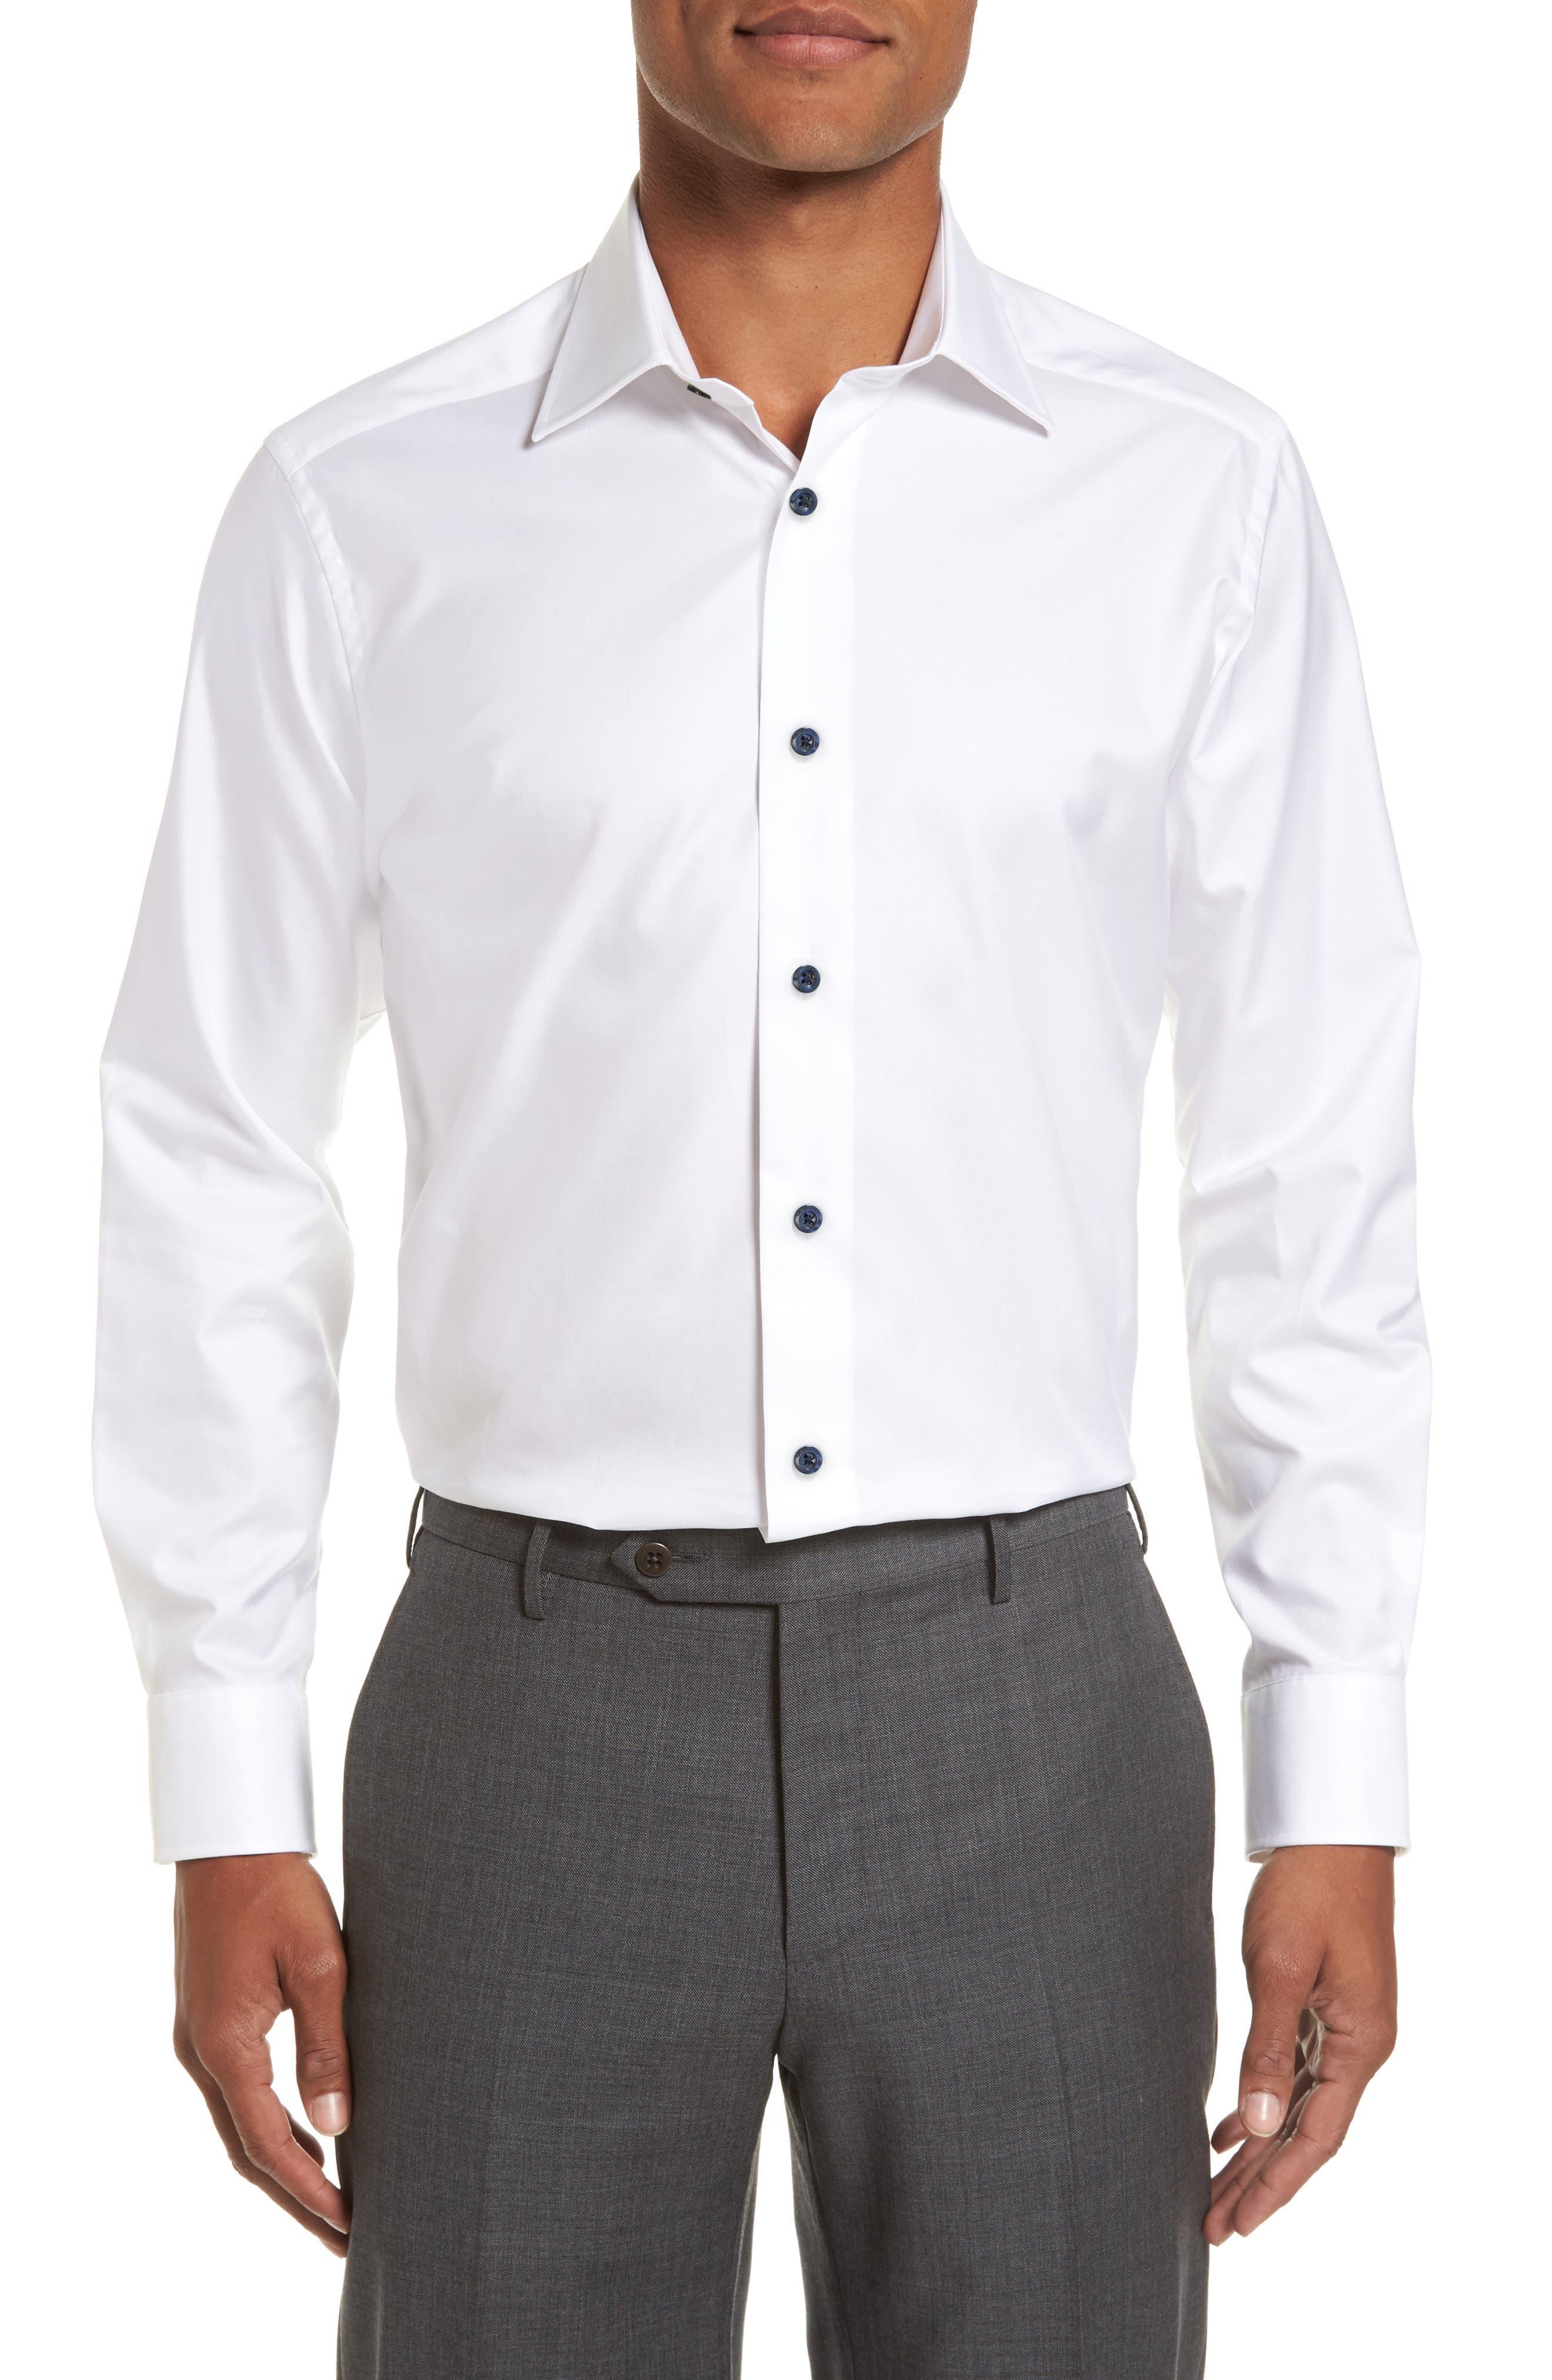 Alternate Image 1 Selected - David Donahue Slim Fit Solid Dress Shirt